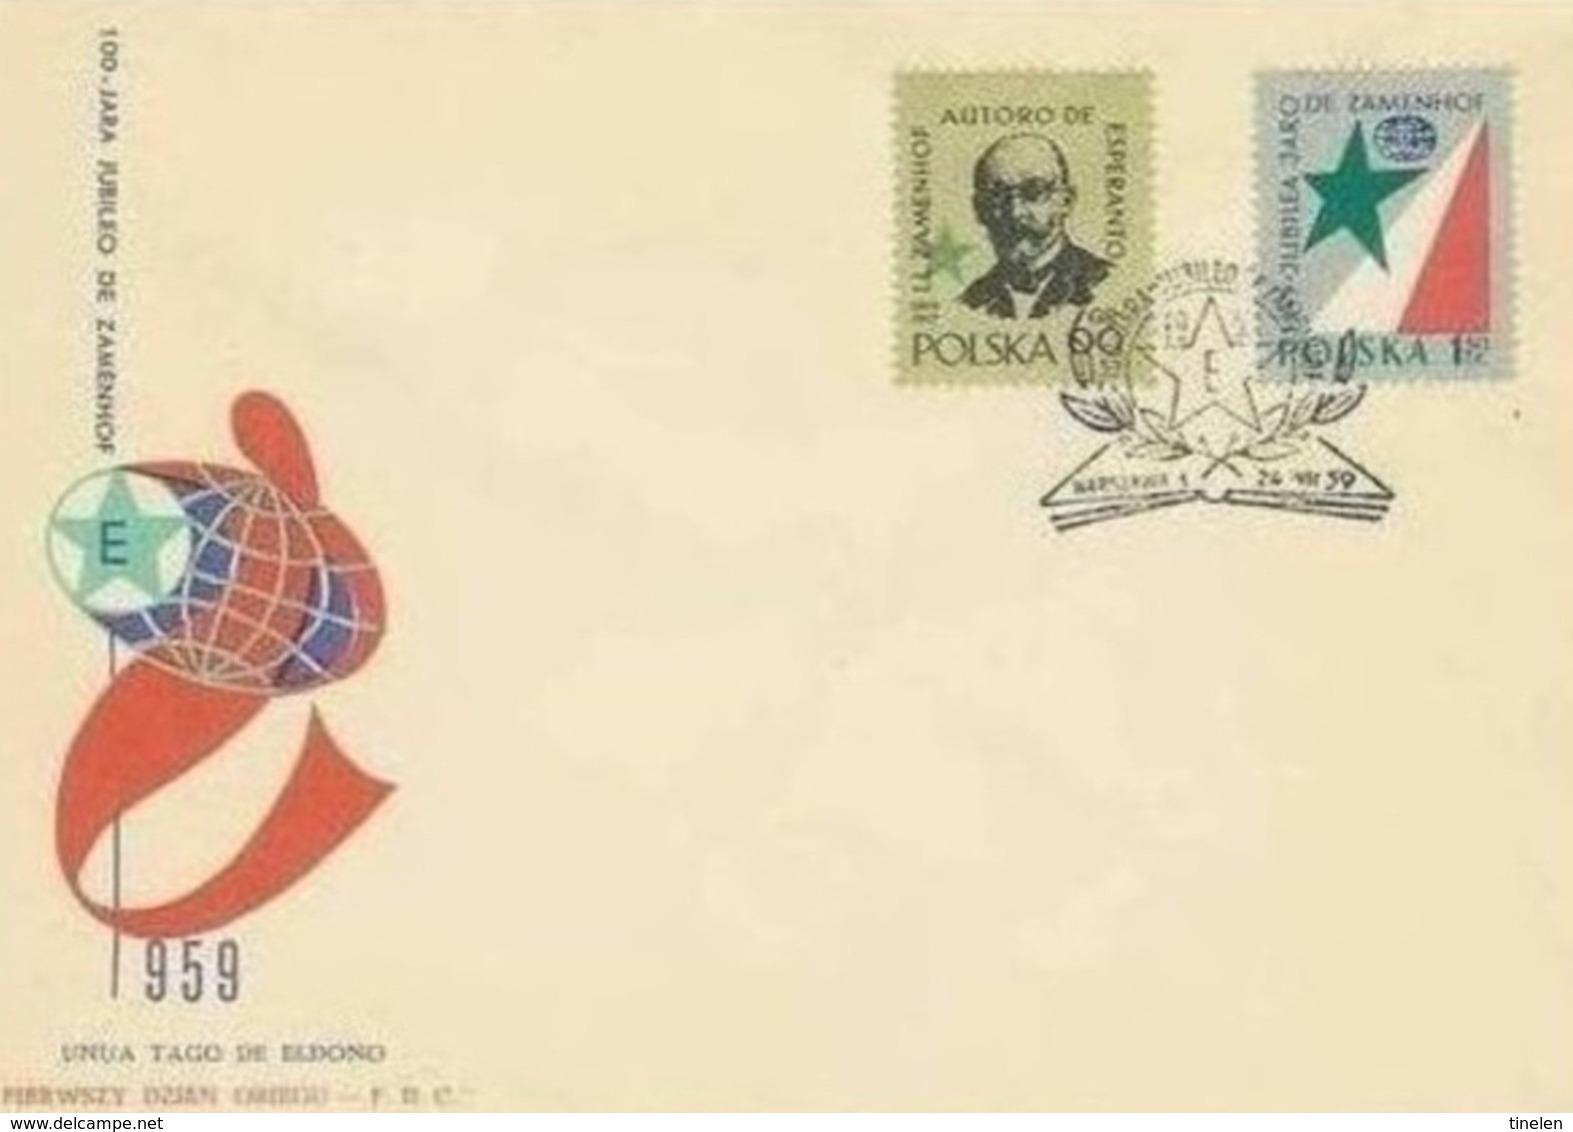 POLONIA - 24 7 1959  FDC ESPERANTO - Esperanto